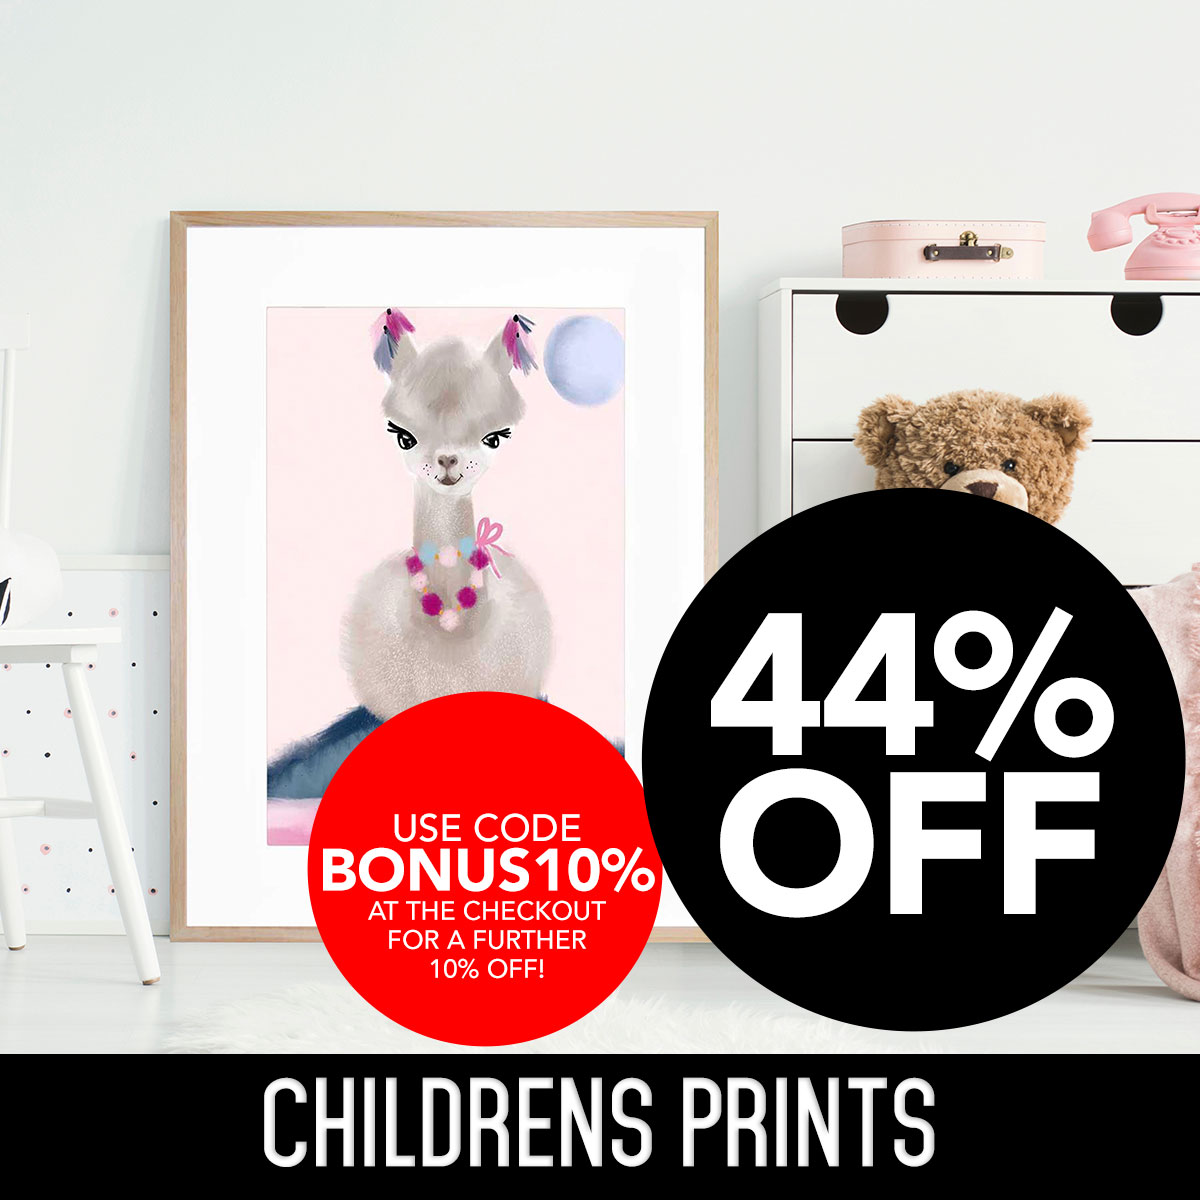 CHILDRENS PRINTS